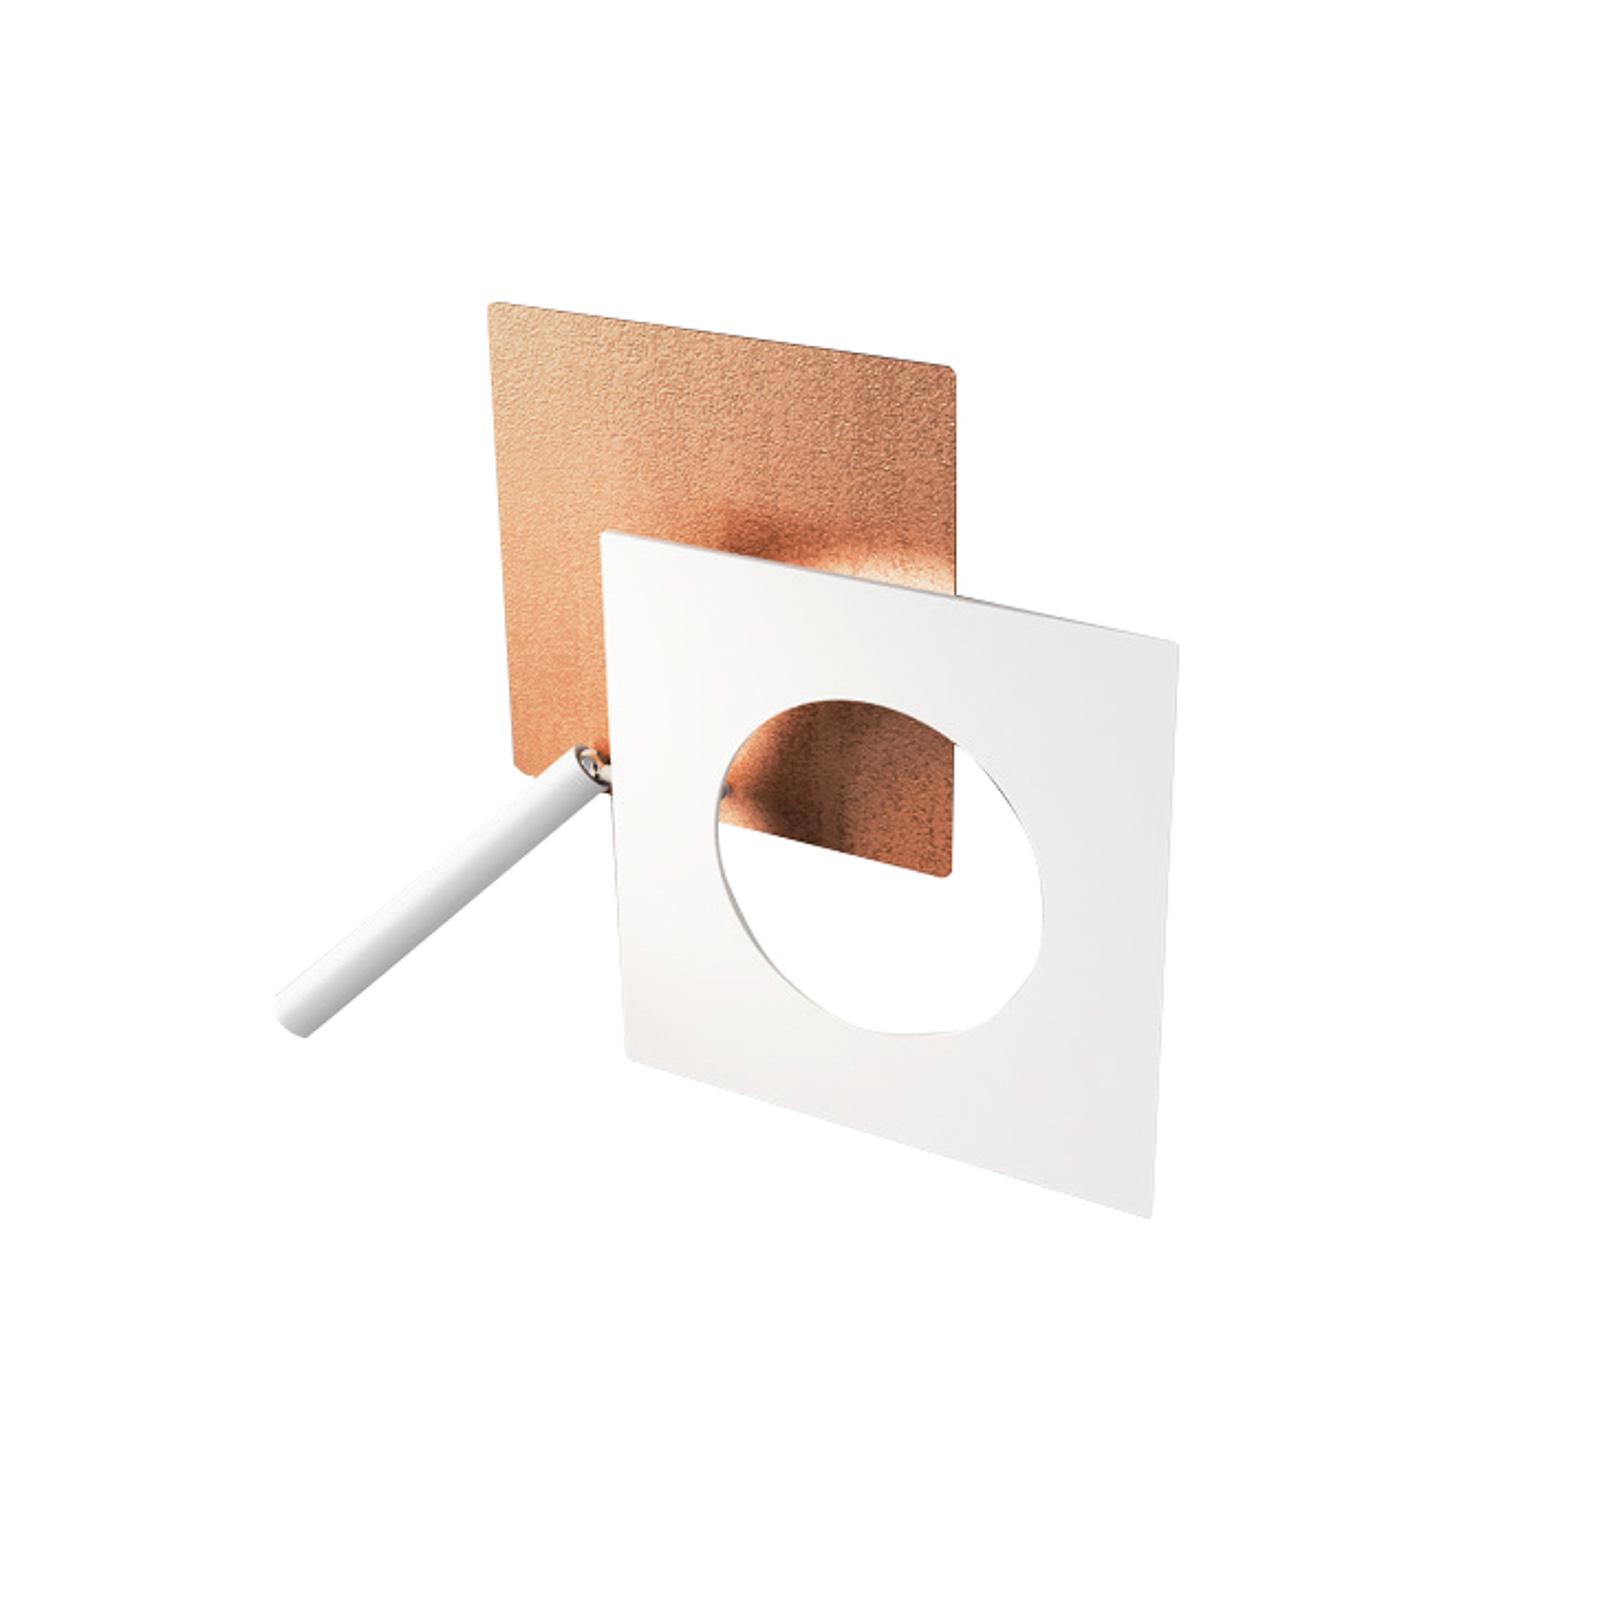 ICONE LED-Wandleuchte Petra 21.L, kupfer, weiß